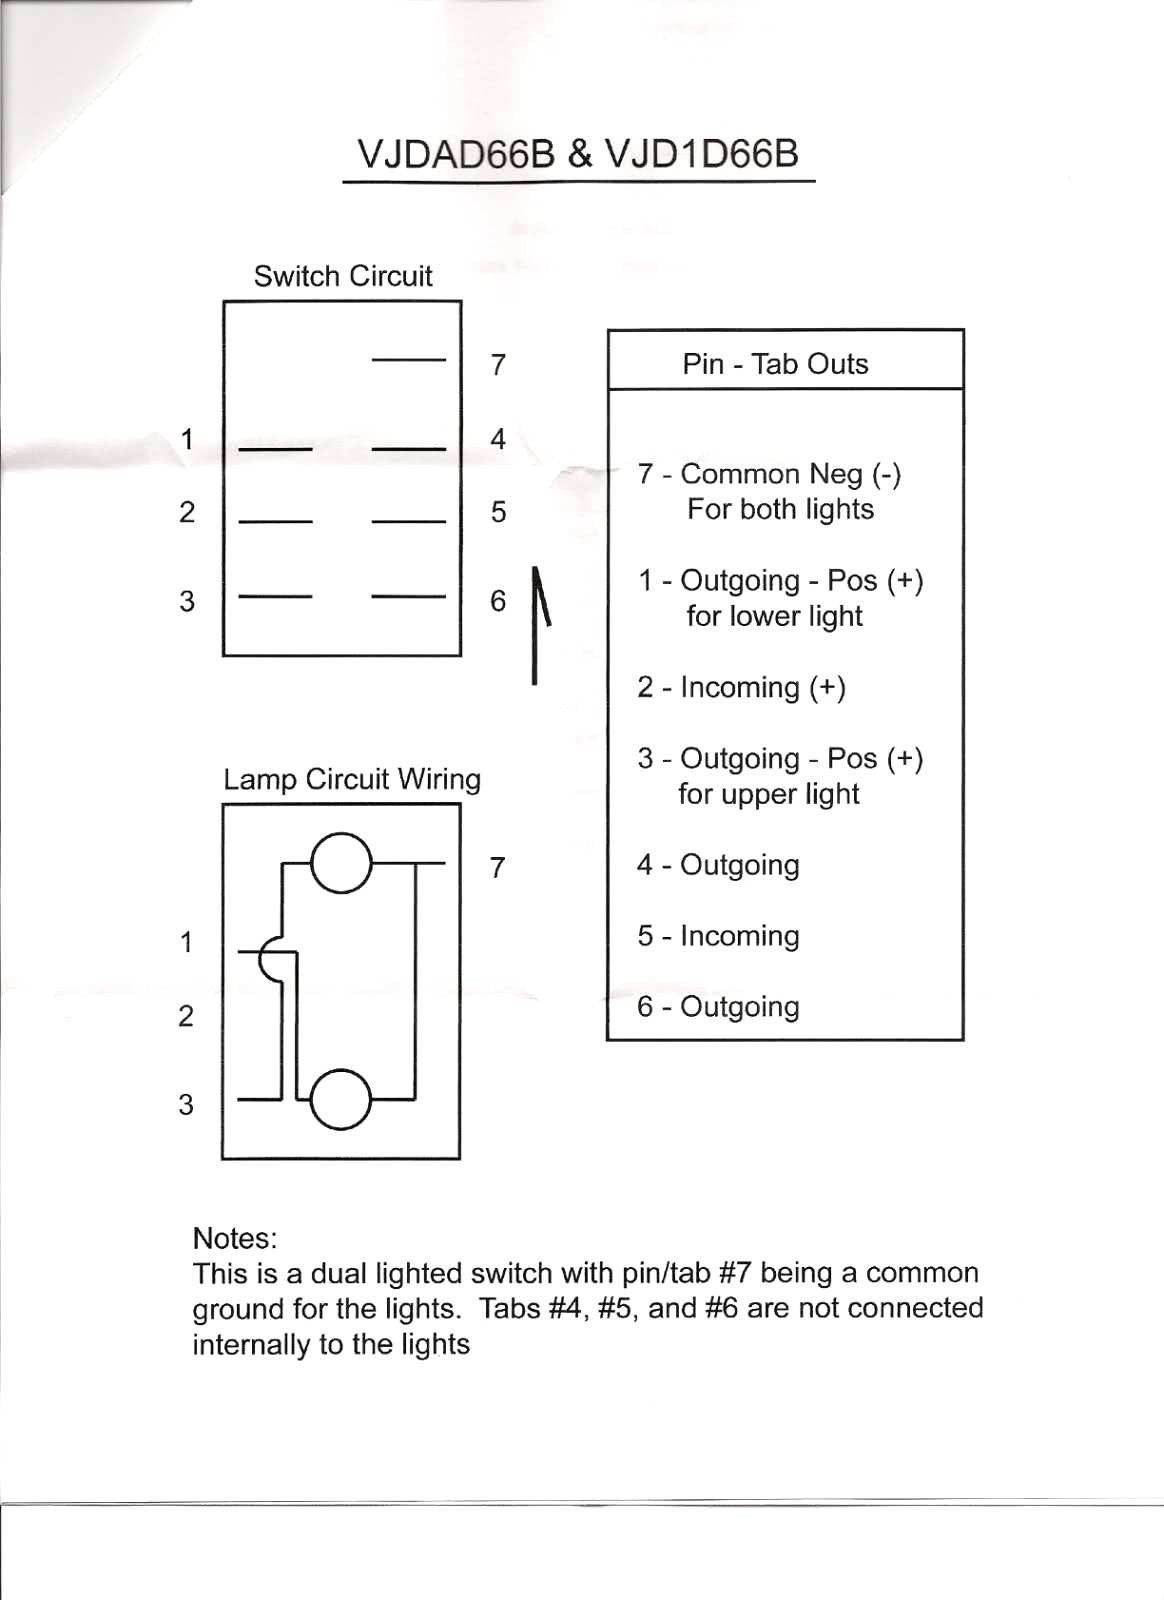 Illuminated Rocker Switch Wiring Diagram Awesome   Wiring Diagram Image